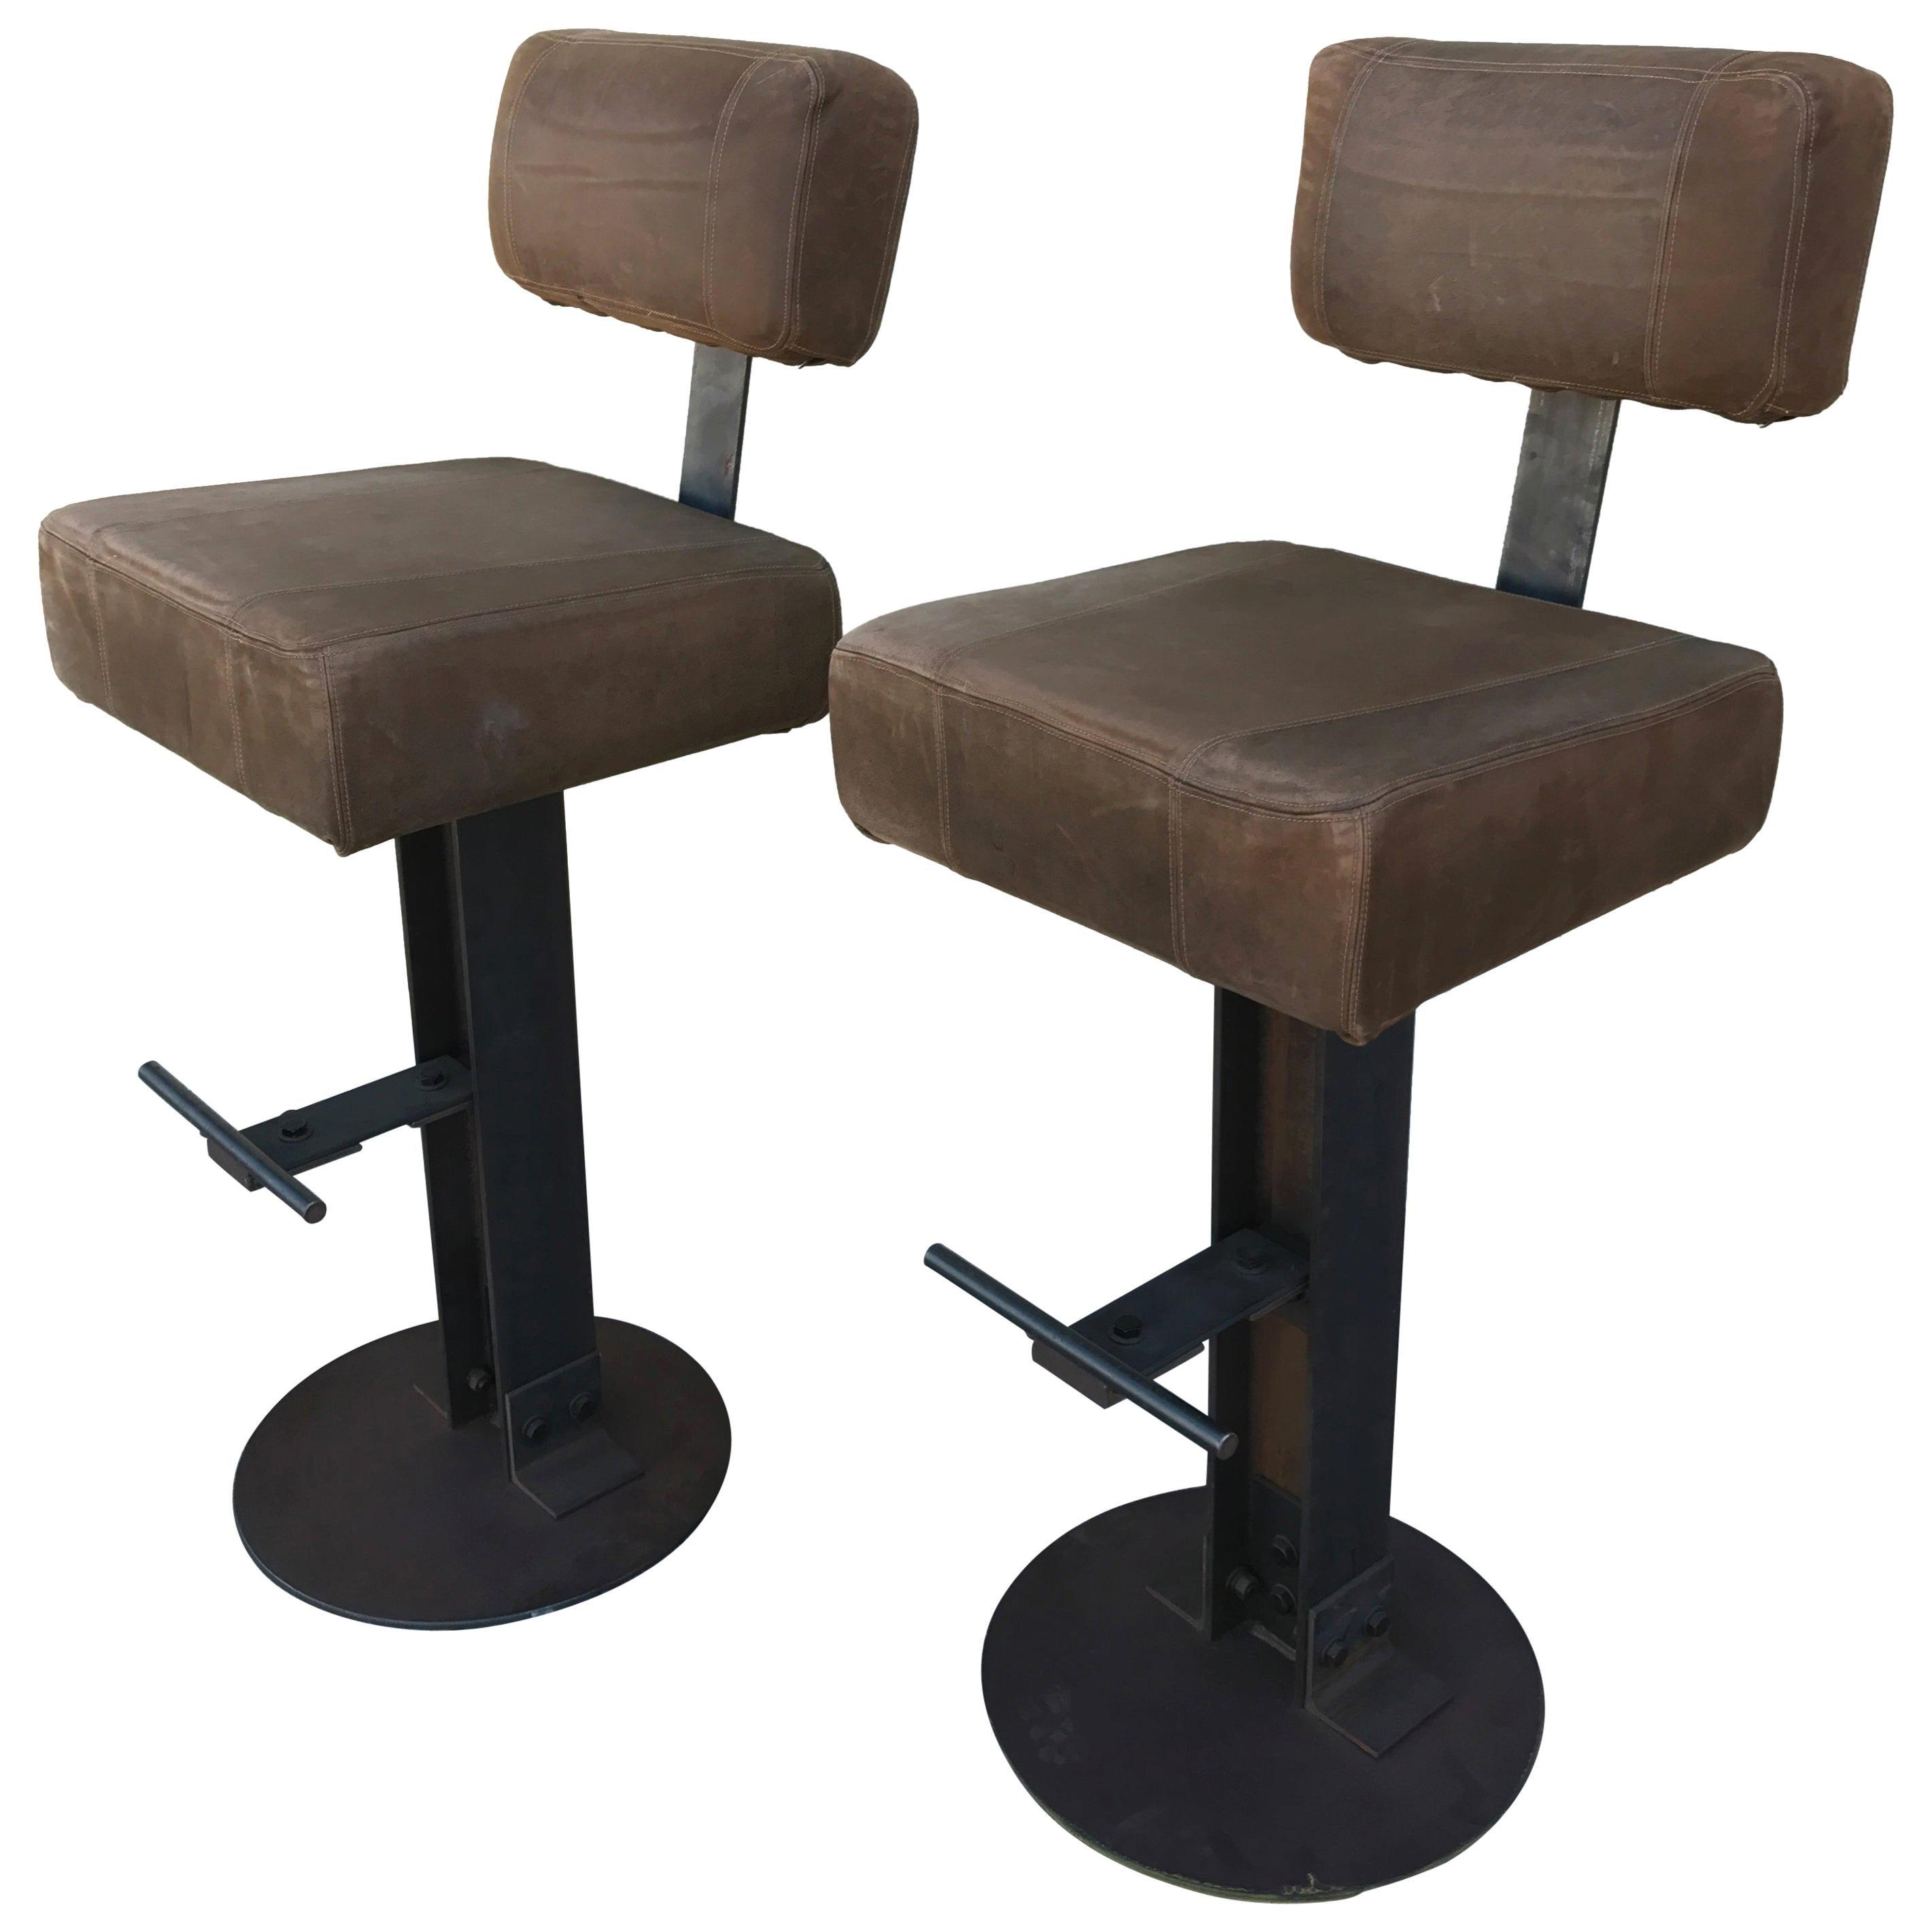 Pleasing Industrial Bar Stools 118 For Sale On 1Stdibs Ibusinesslaw Wood Chair Design Ideas Ibusinesslaworg